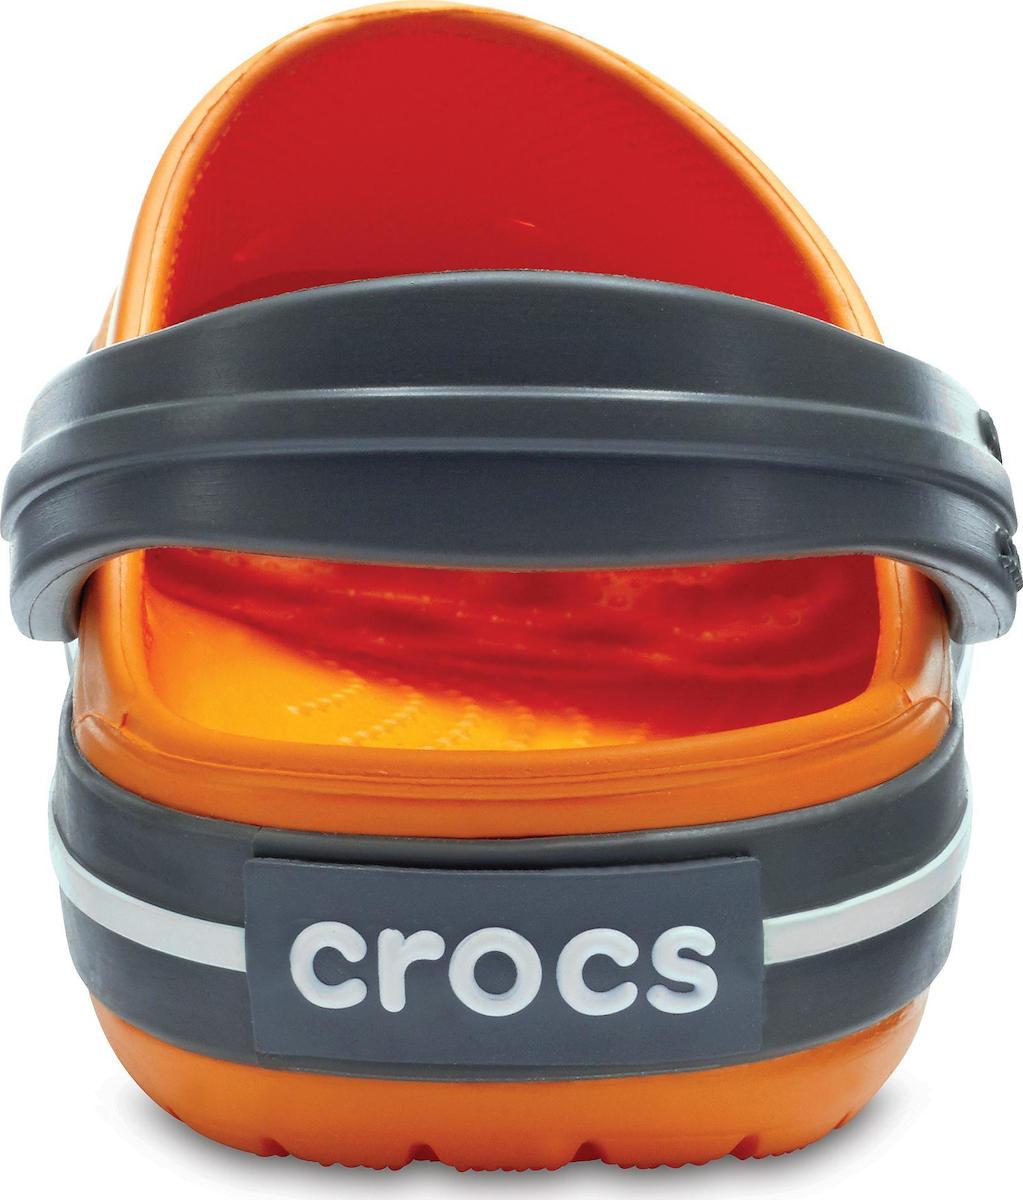 Crocs Crocband Kids Blazing Orange Slate Grey 204537-82N - Skroutz.gr 9b4fa59f895